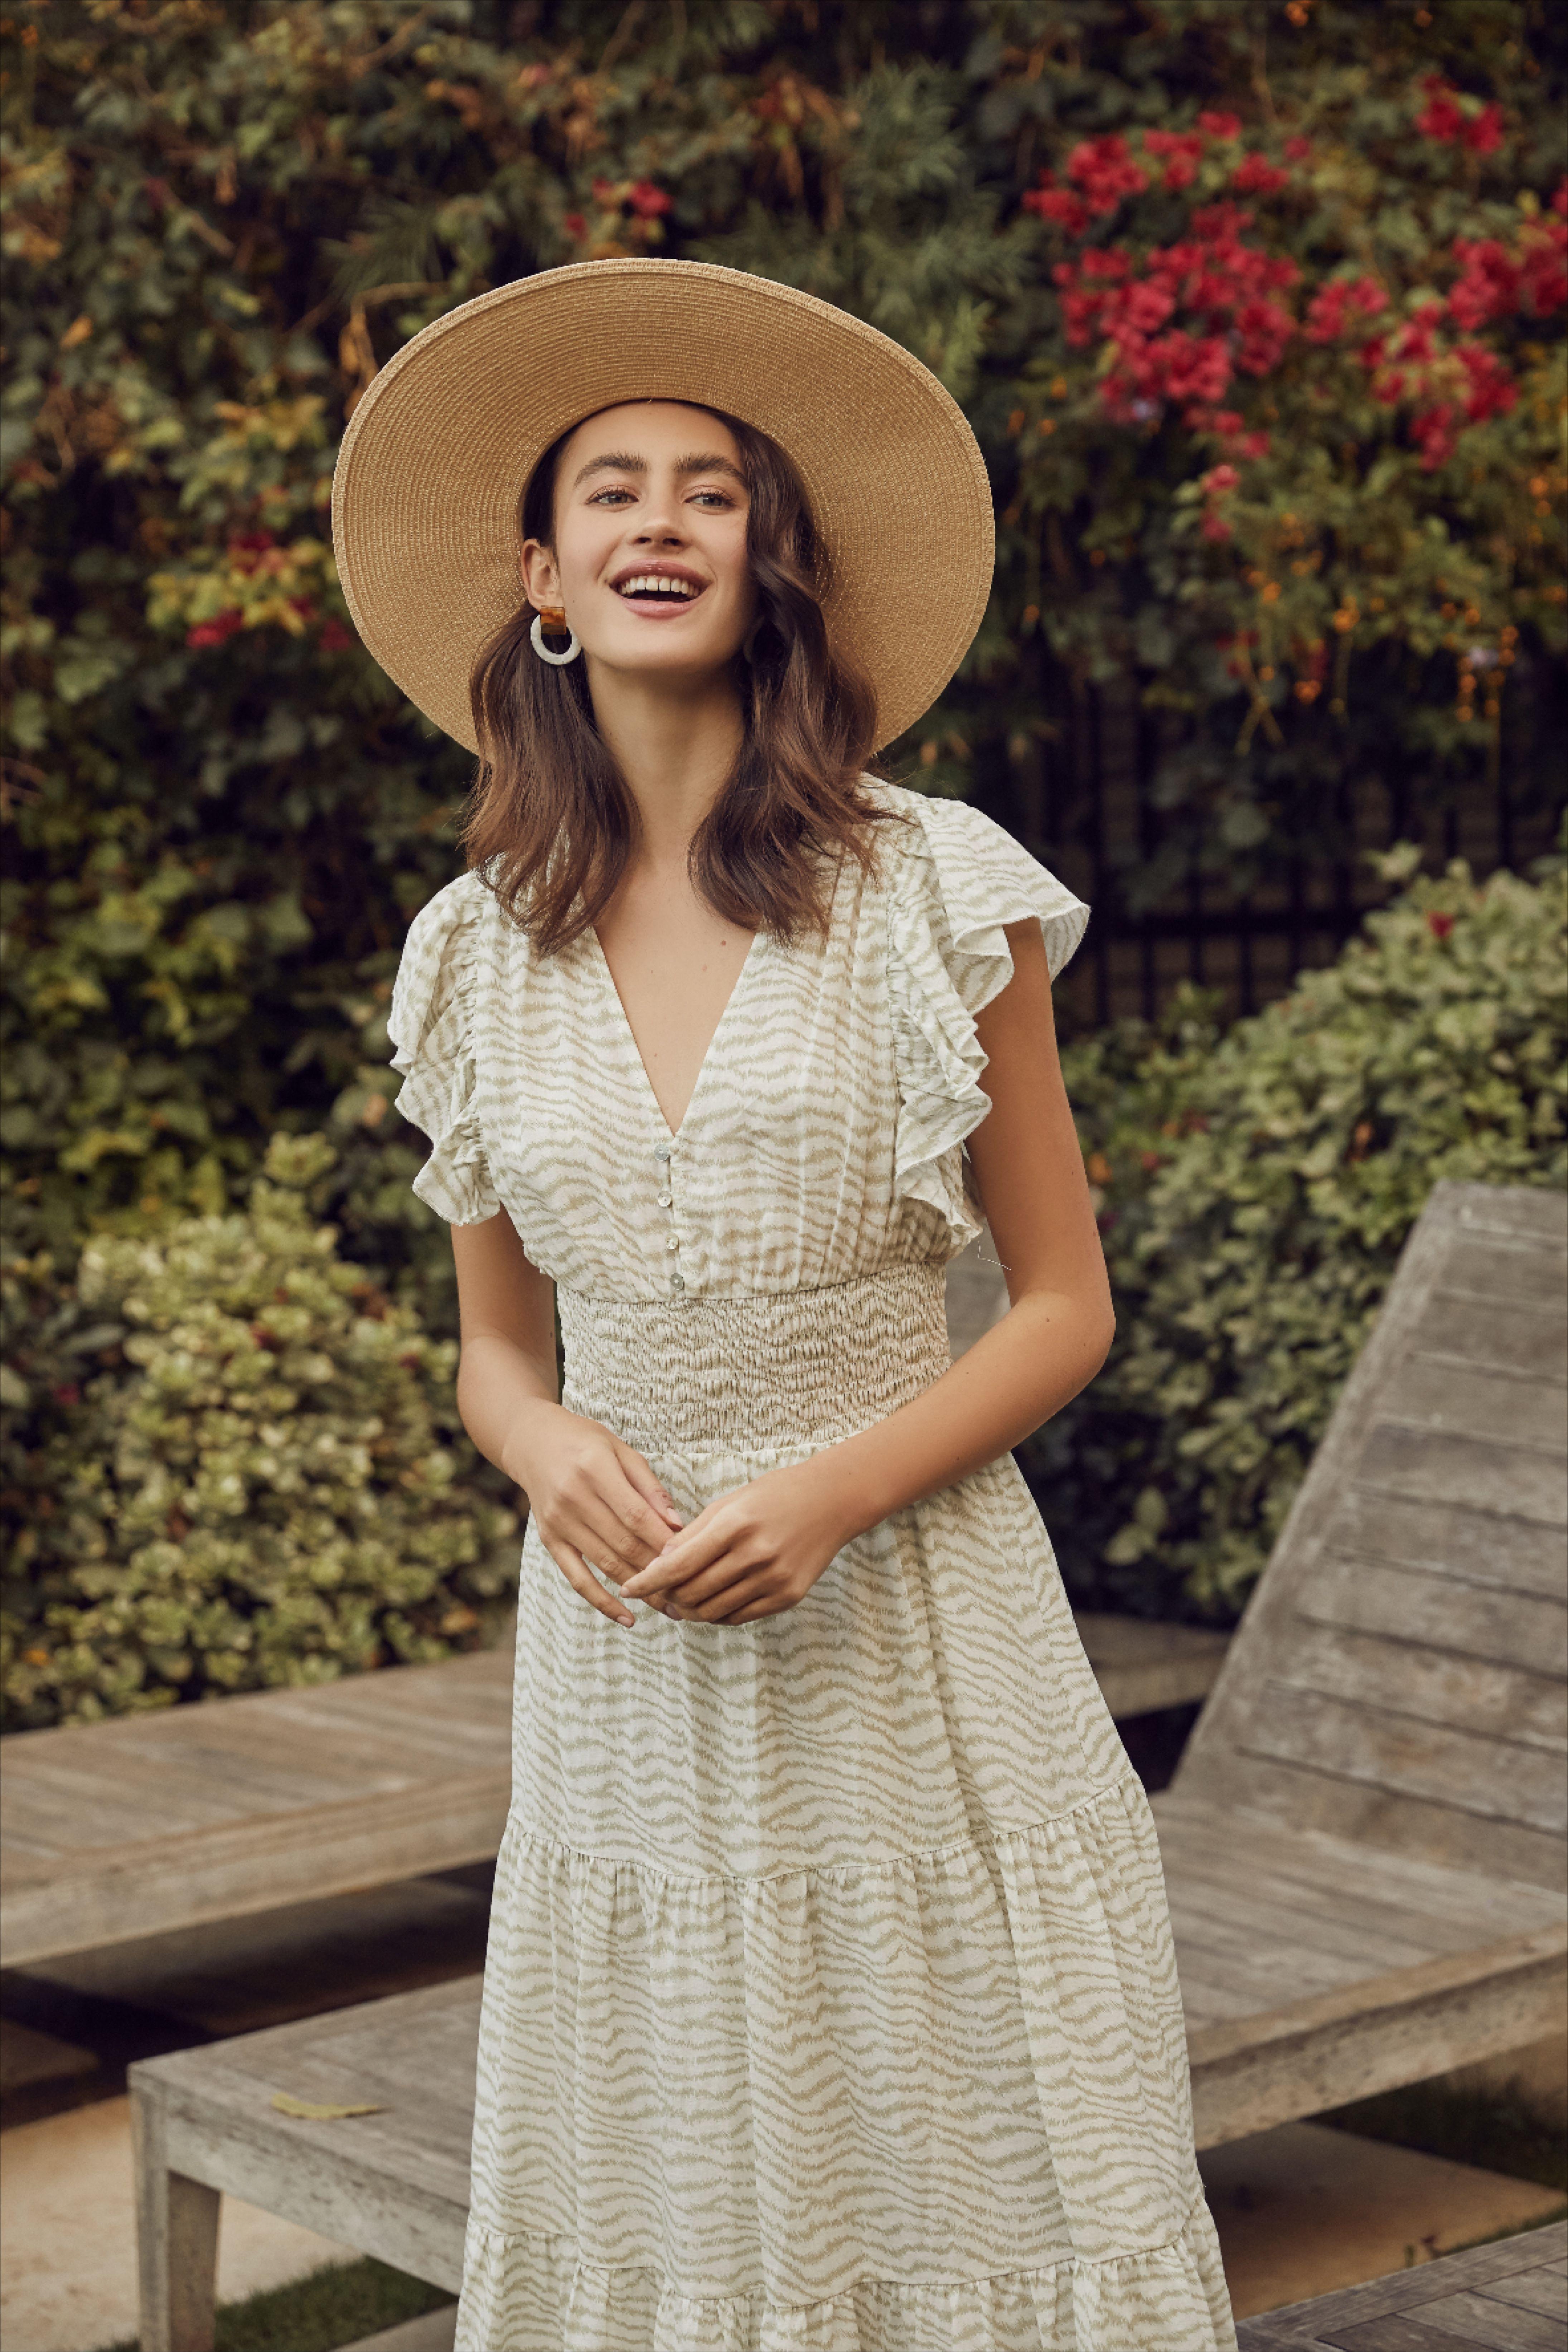 Breezy Summer Dress Stunning Dresses 70s Inspired Fashion Dresses [ 6570 x 4380 Pixel ]